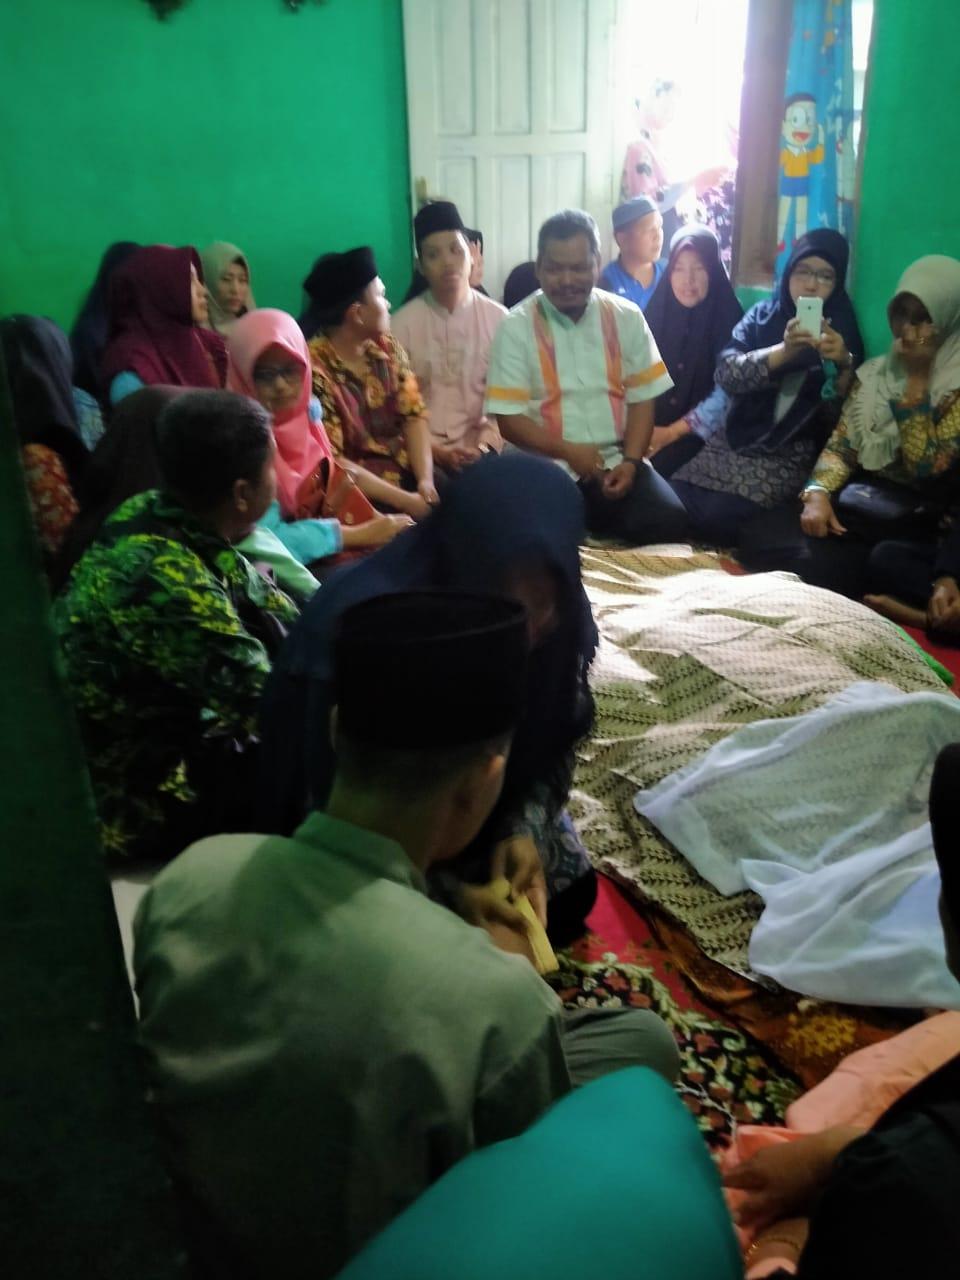 Mtsn 1 Me Berduka Atas Kehilangan Salah Seorang Siswa Terbaik Radar Nusantara News